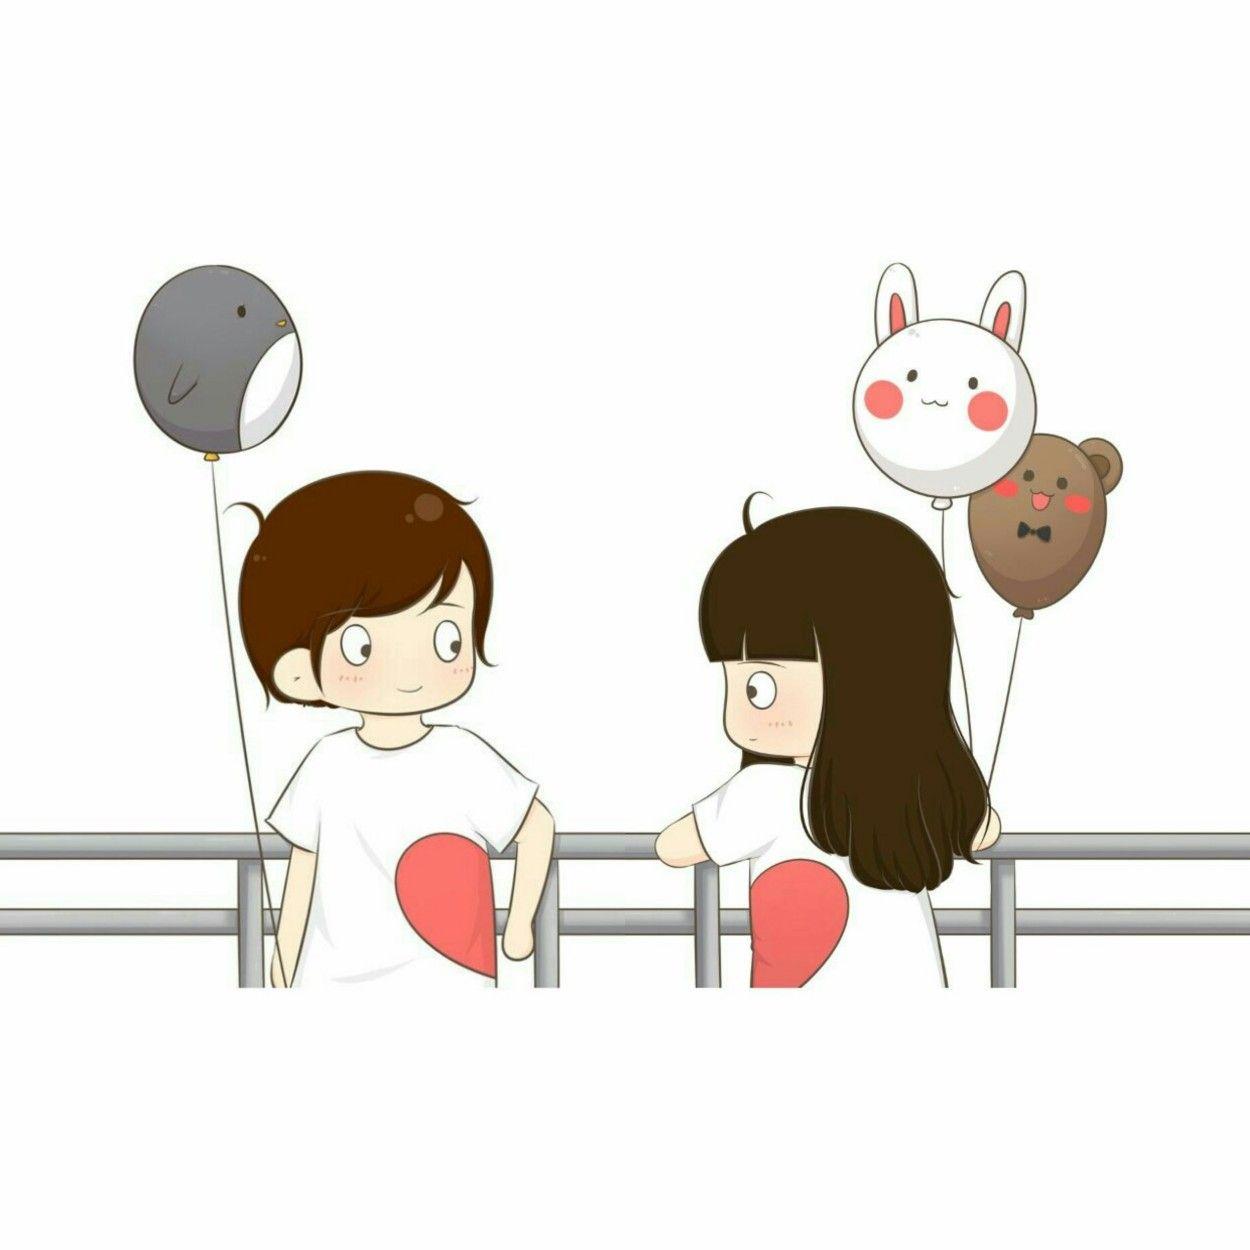 So Cutee Cute Cartoon Wallpapers Cute Couple Wallpaper Cute Love Wallpapers